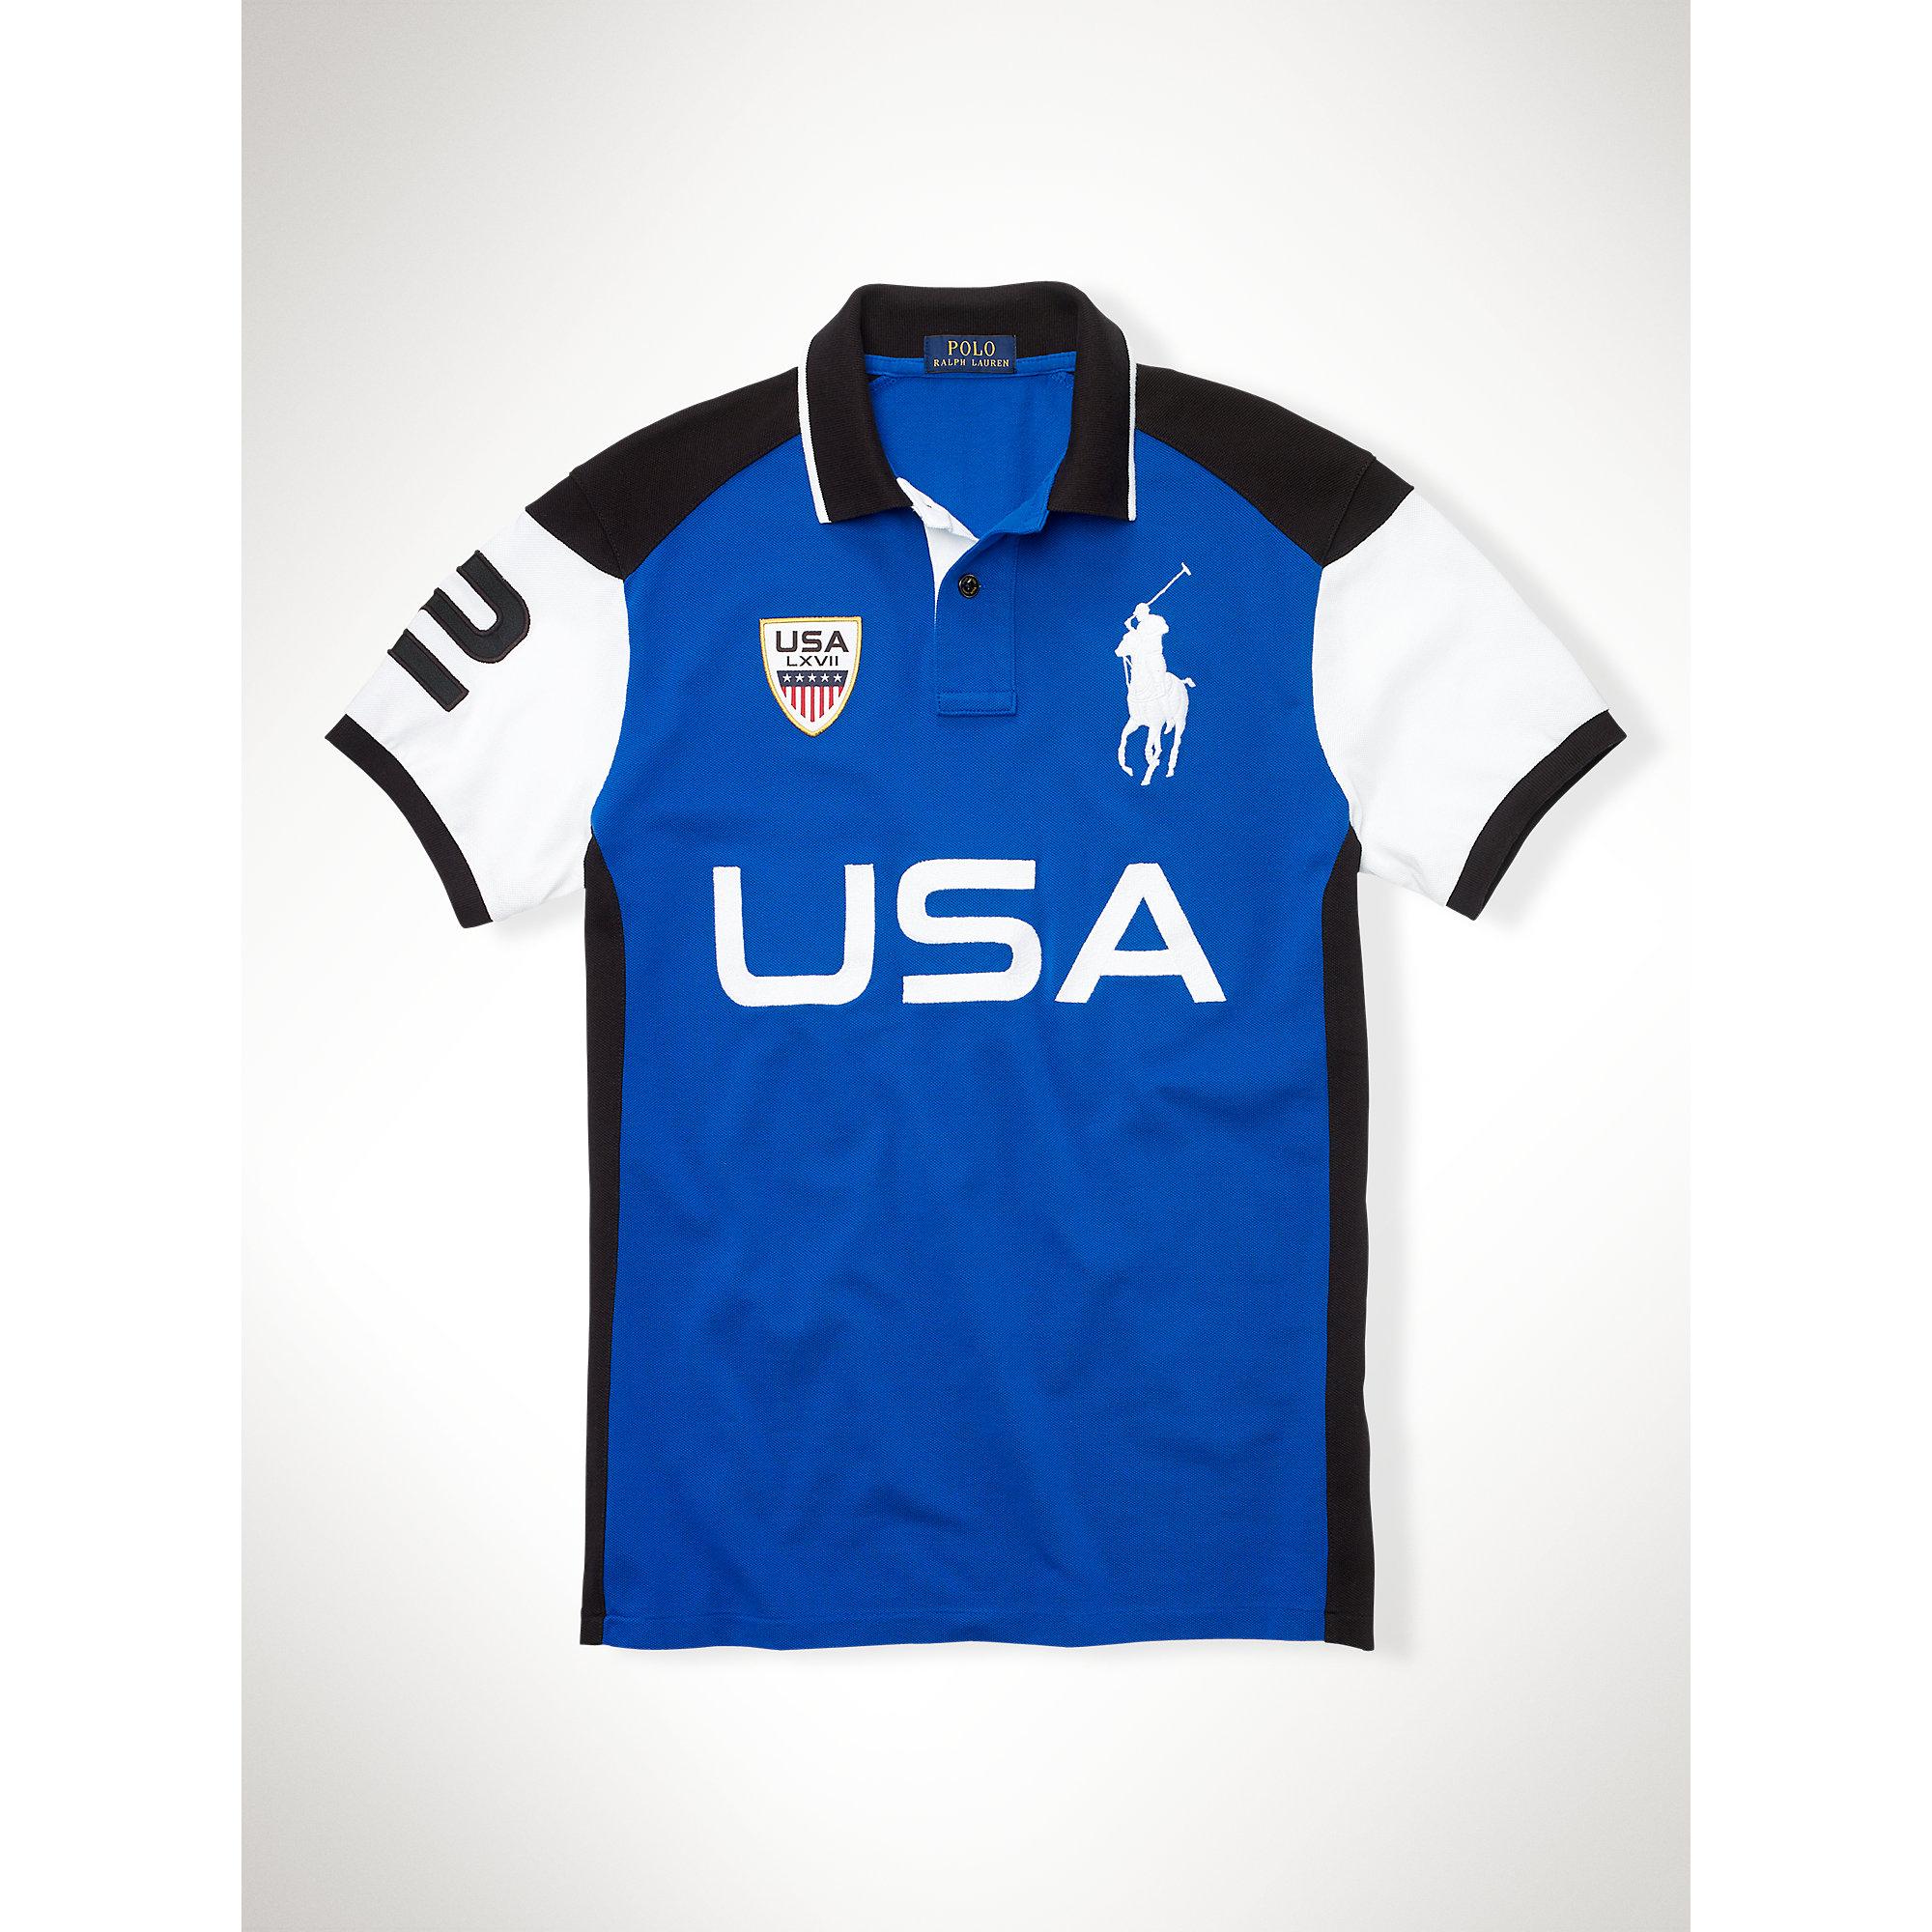 Shirts Polo Polo Polo Usa Usa Shirts Polo Dreamworks Dreamworks Usa Dreamworks Shirts 7ygIfb6Yvm